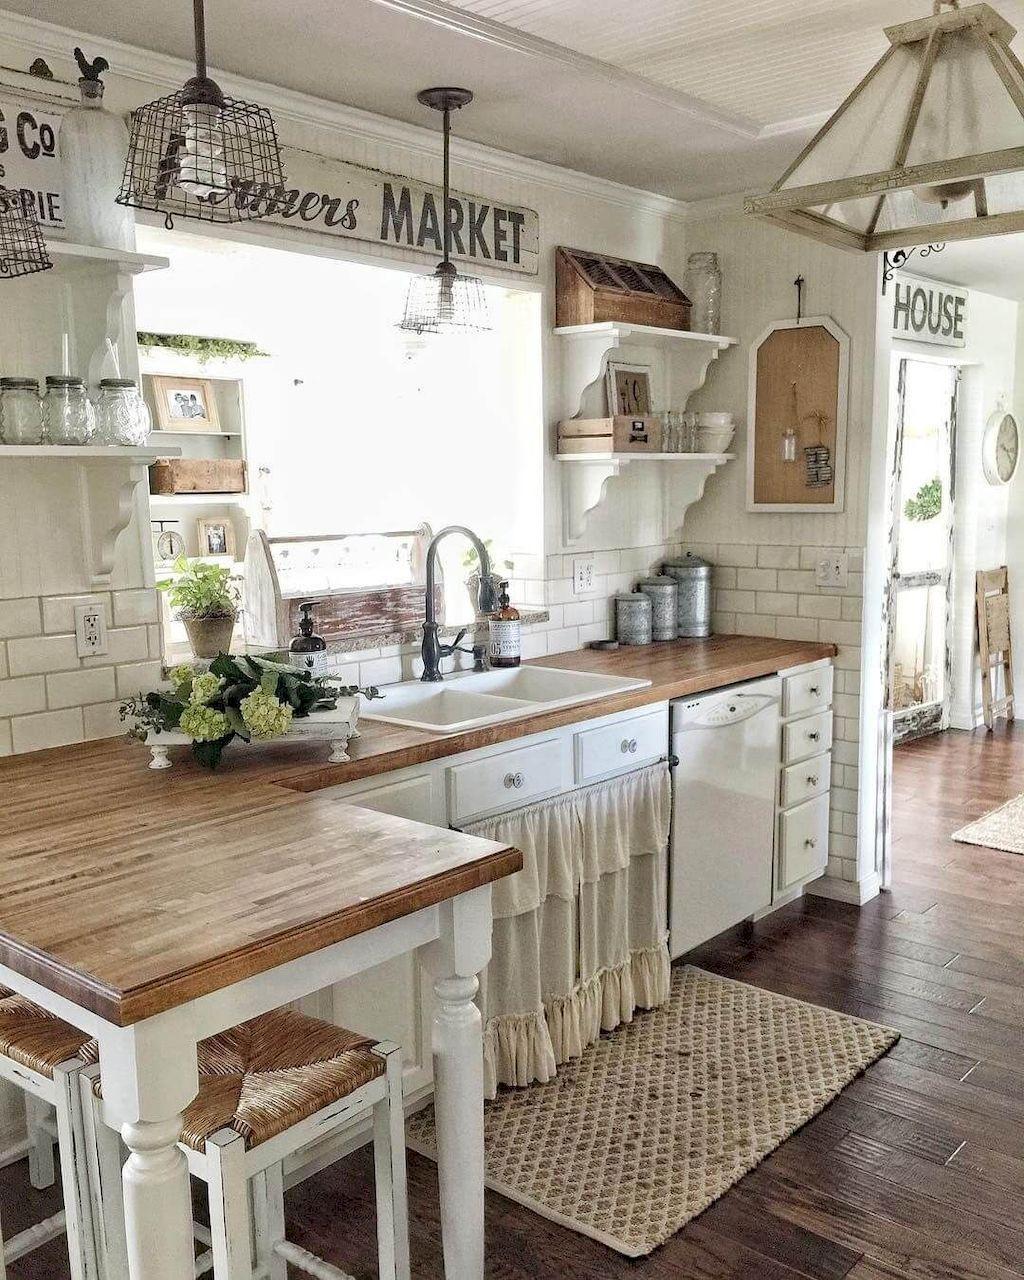 Best Rustic Farmhouse Kitchen in List (71 White